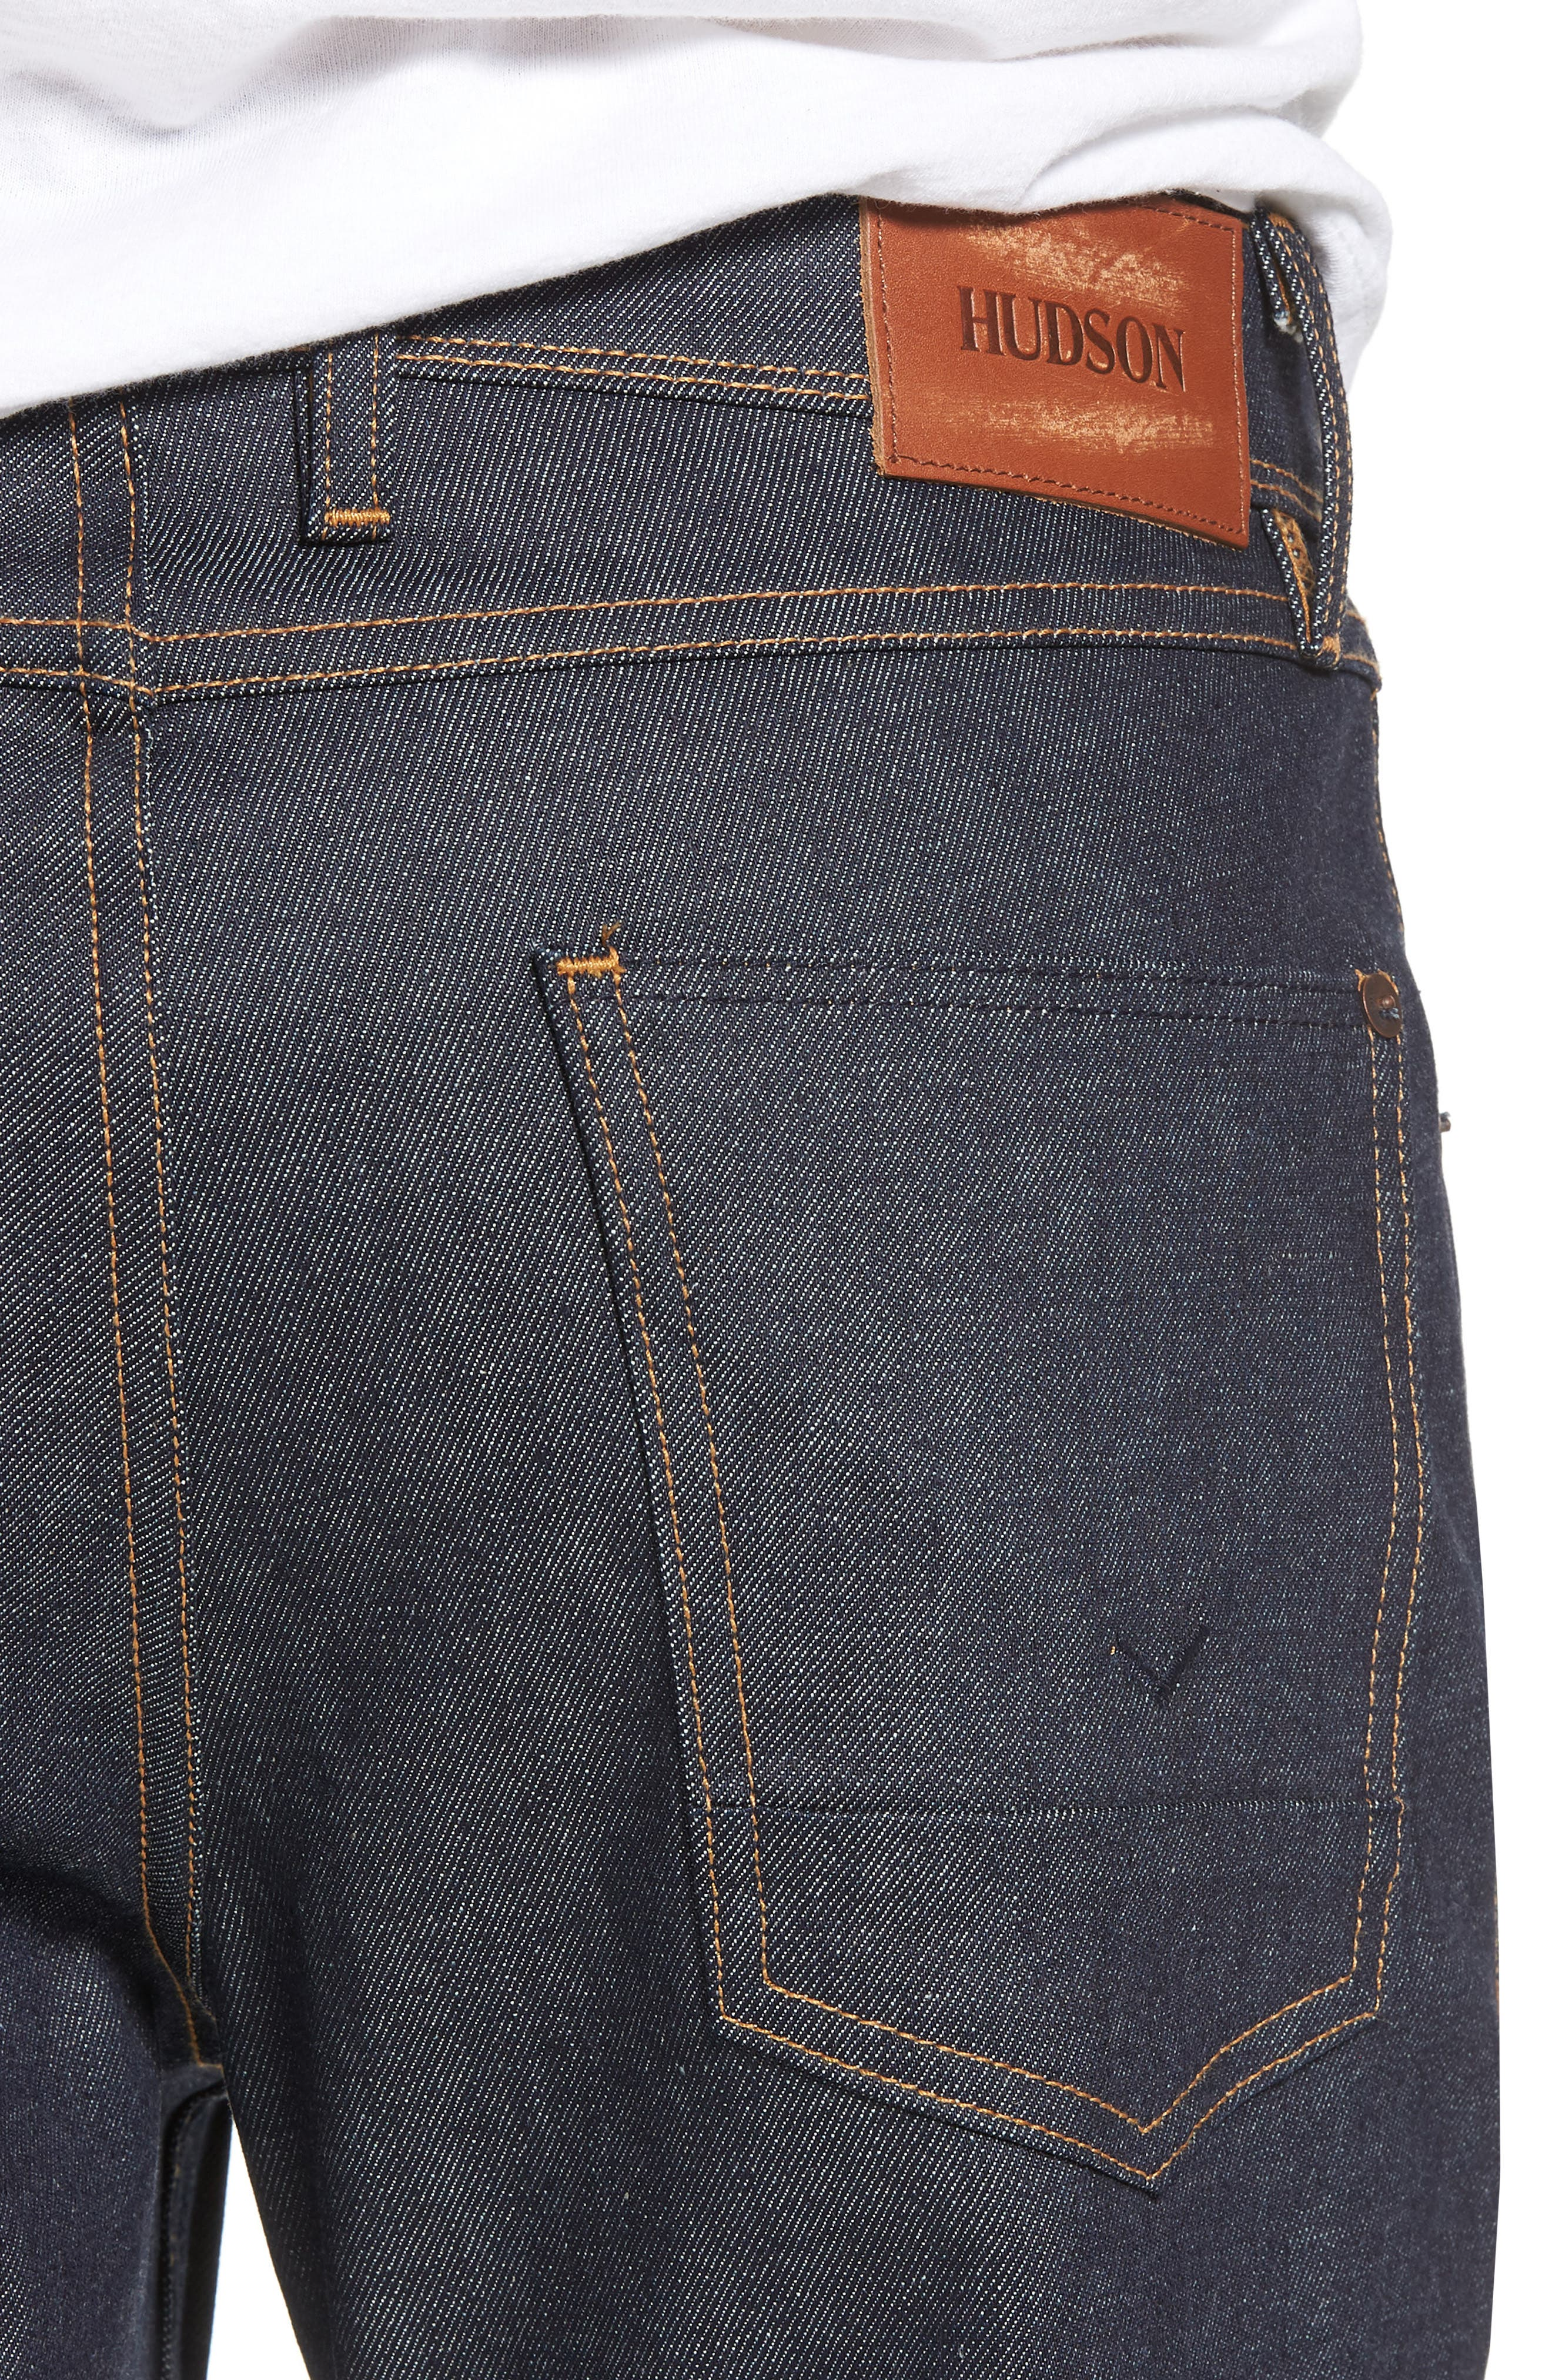 Sartor Skinny Fit Jeans,                             Alternate thumbnail 4, color,                             RAW